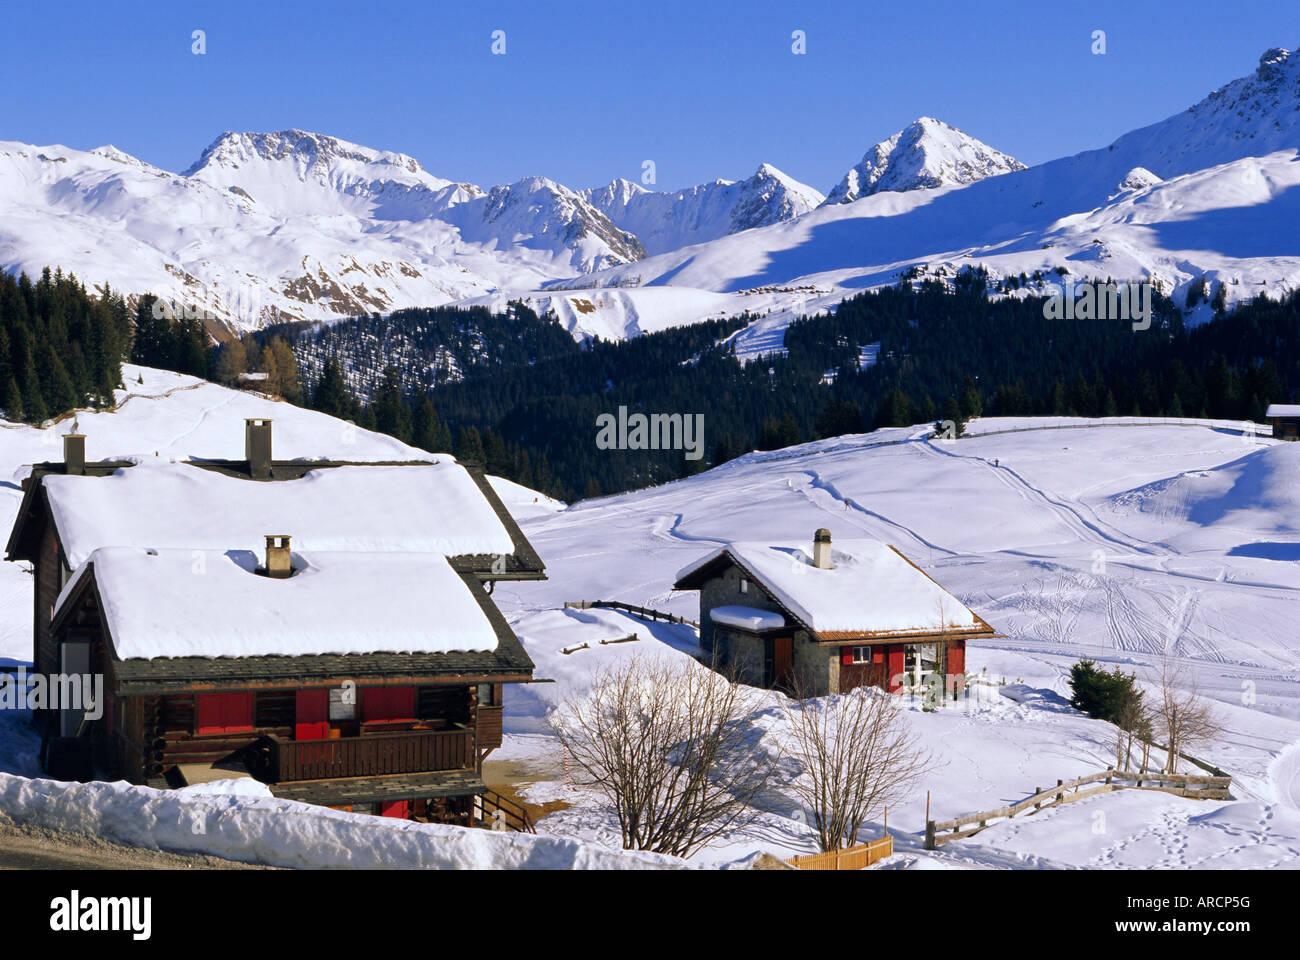 ski resort, arosa, graubunden region, swiss alps, switzerland